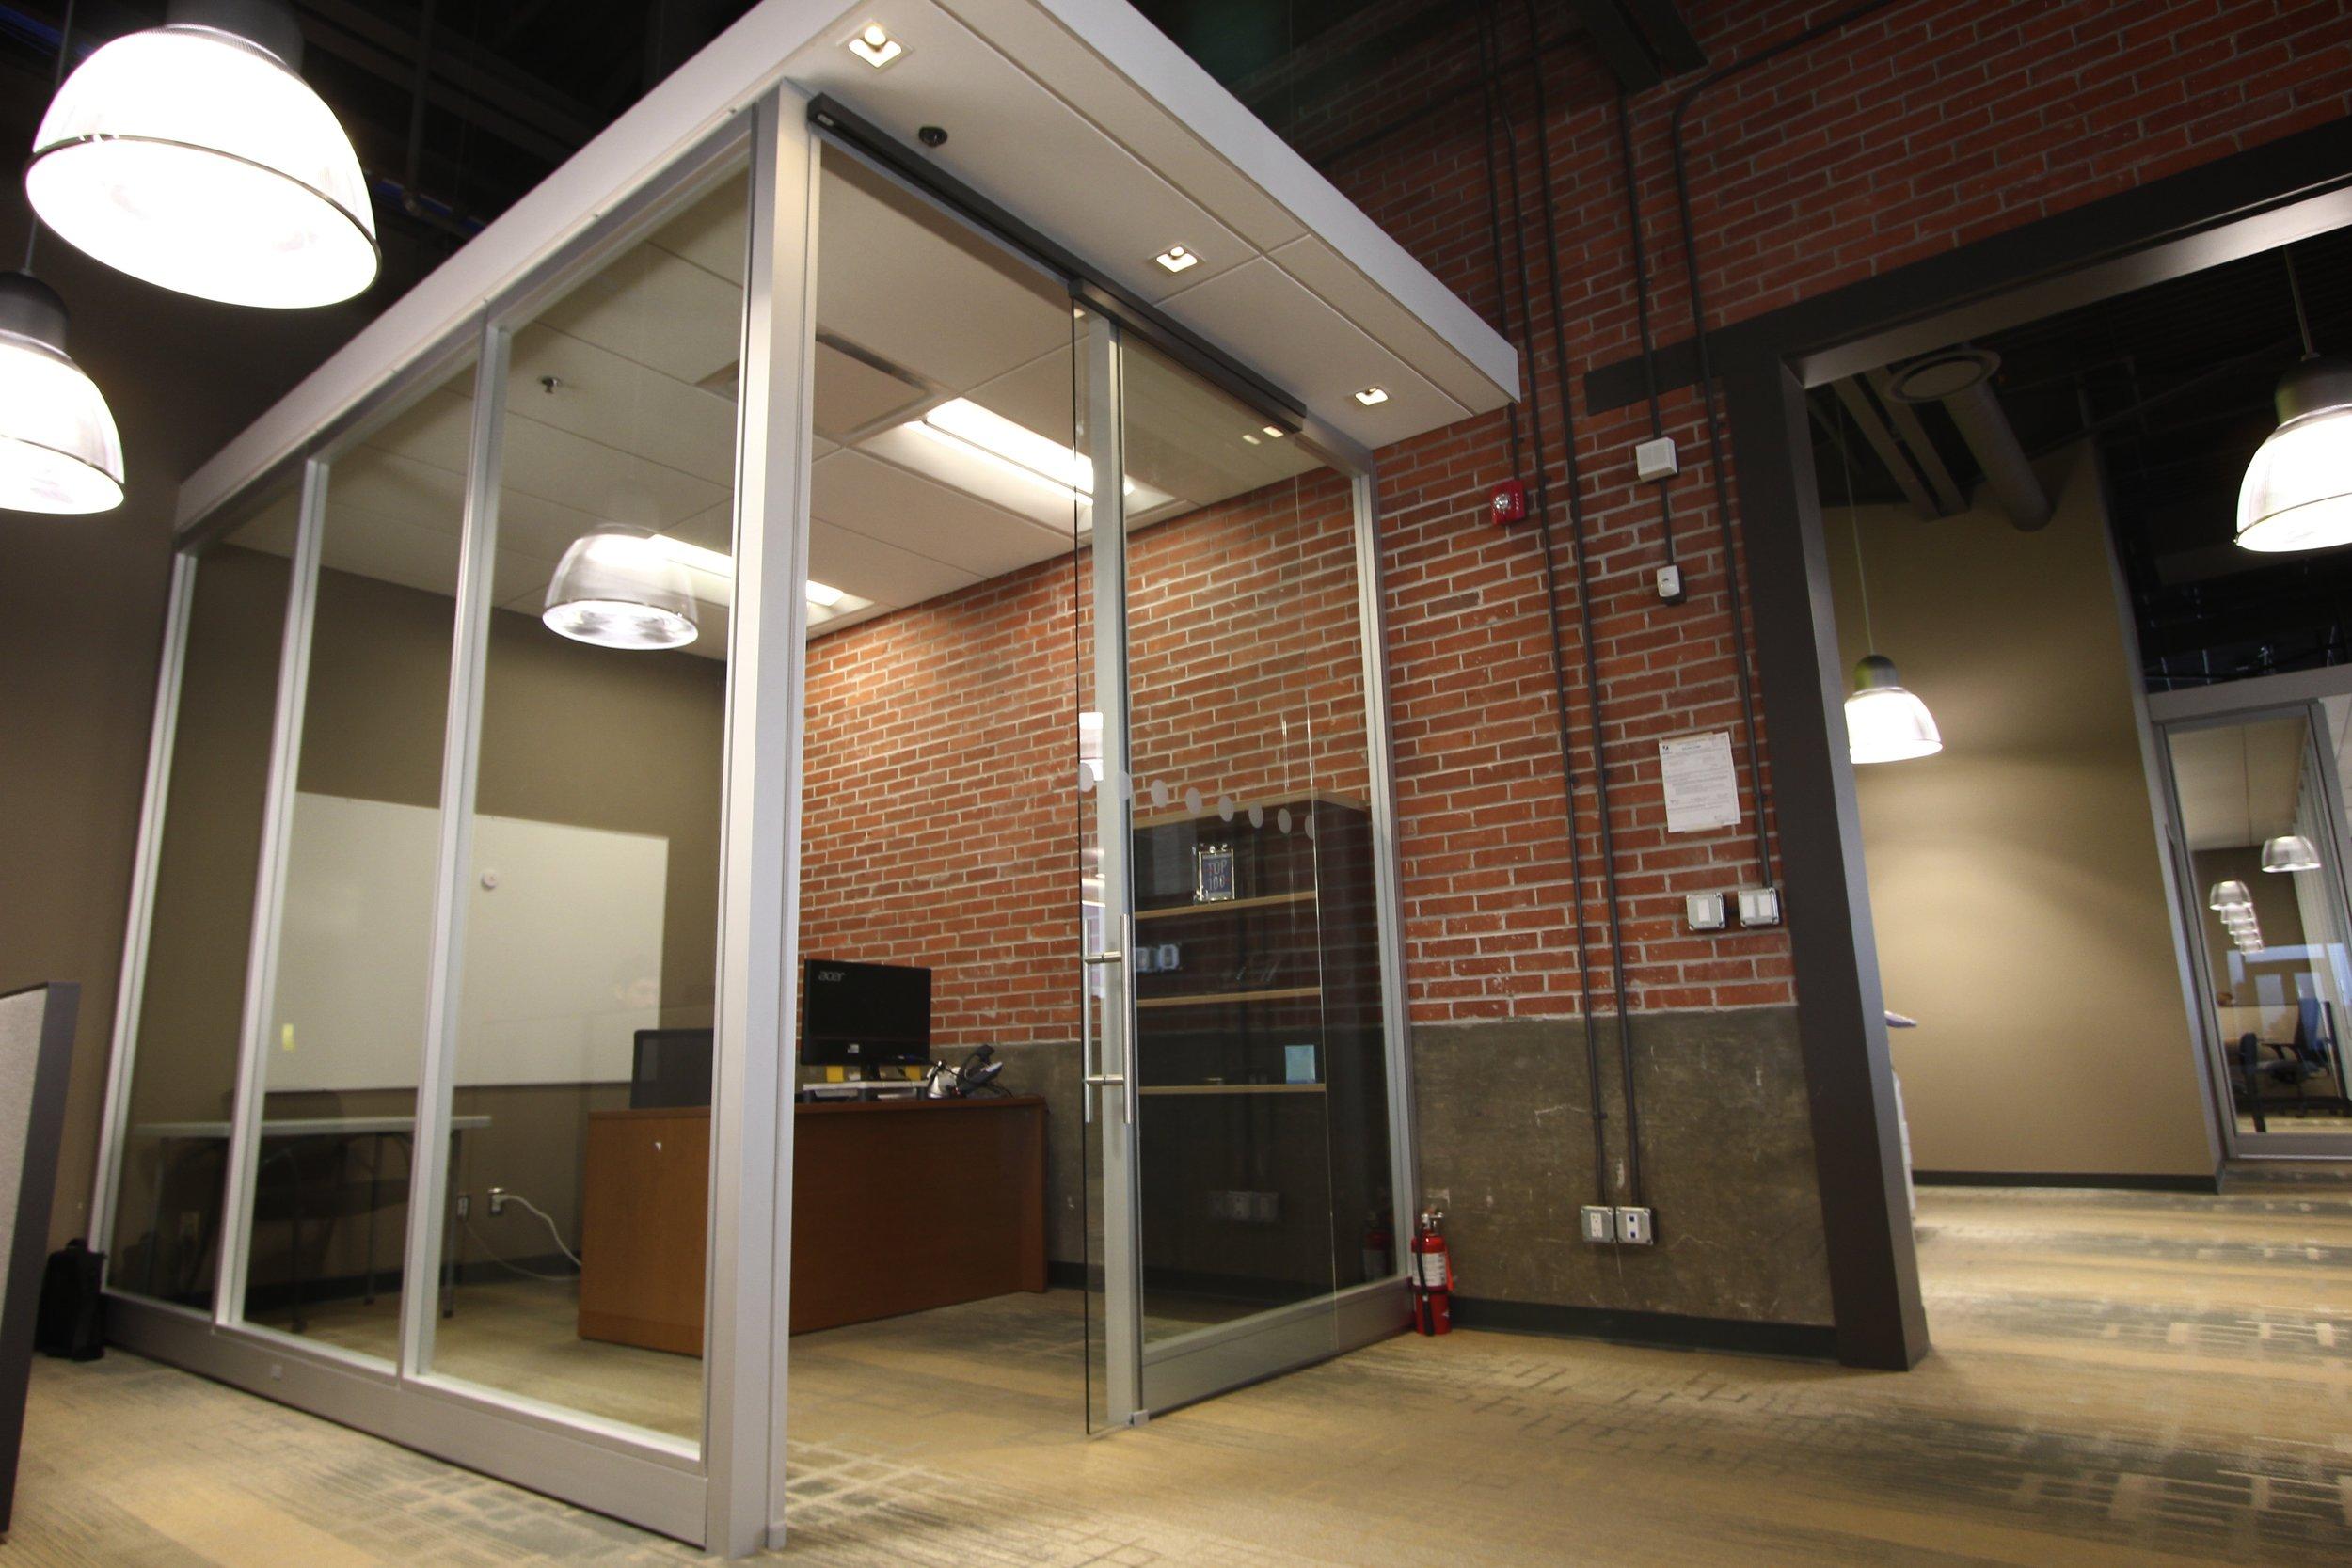 Metric Design, Saskatoon, Interior Design, Renovation, Office Partitions, Glass Partition, Exposed Brick, Pendant Lighting.jpg